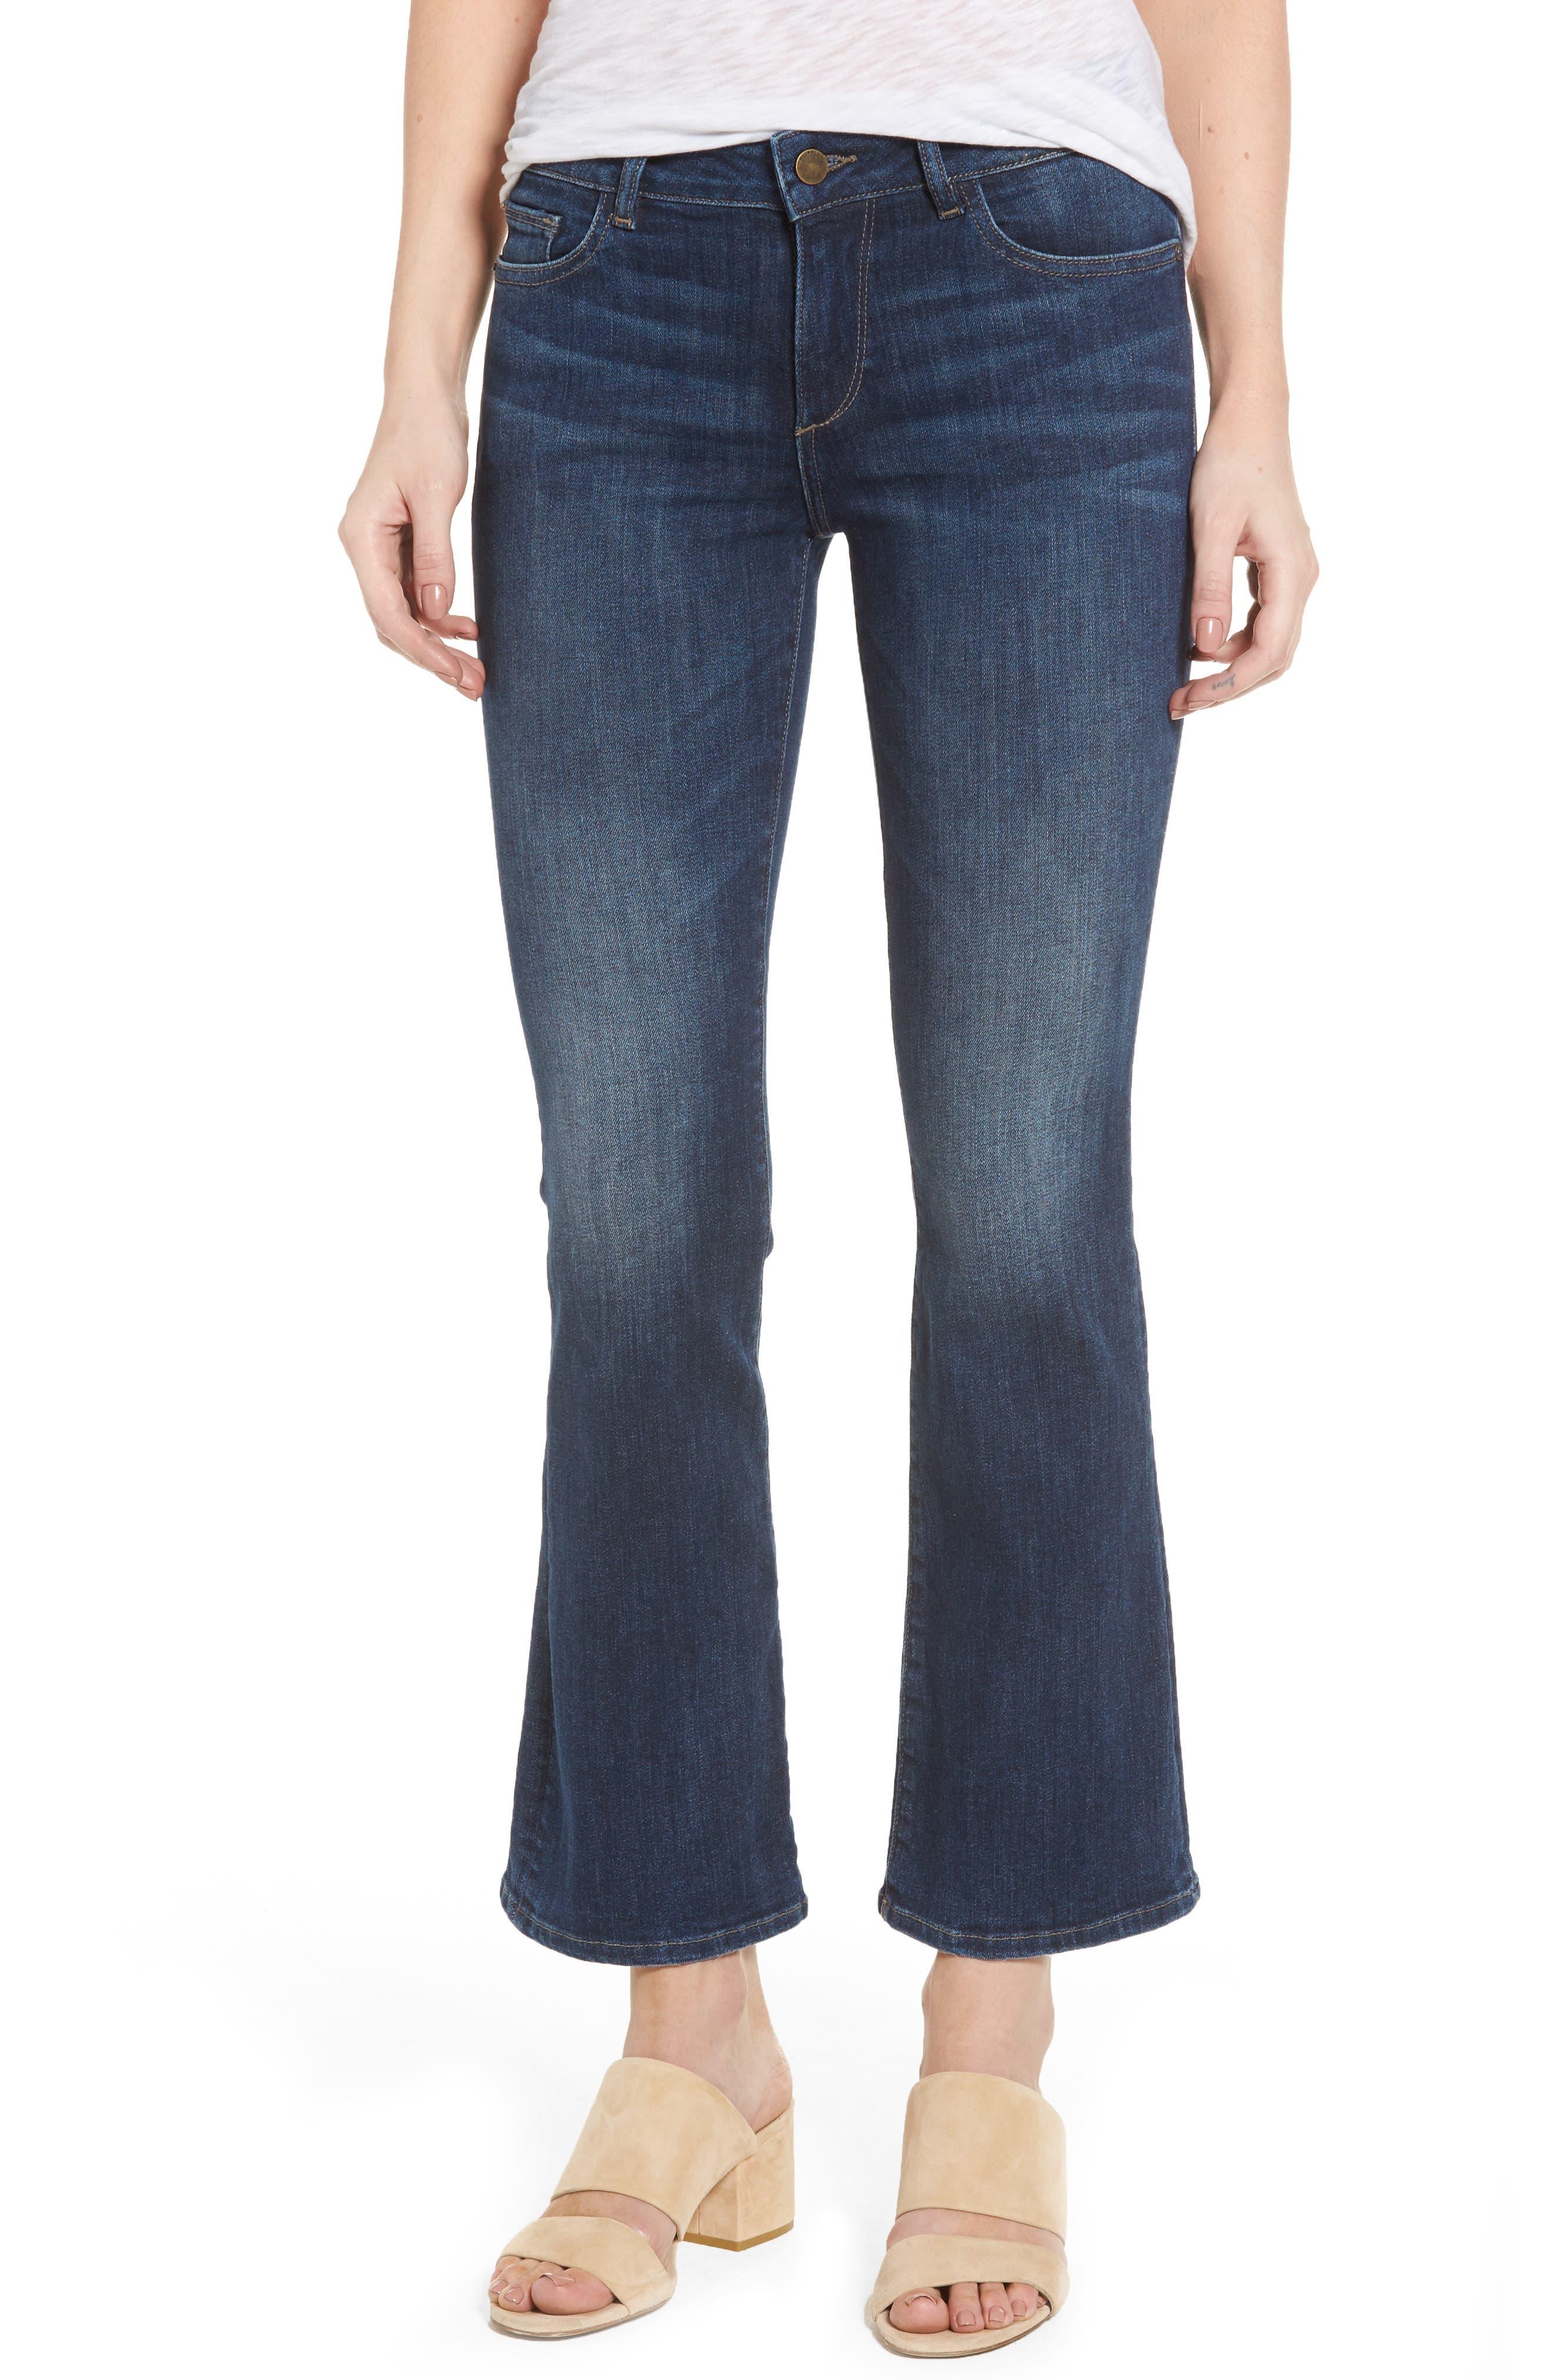 Main Image - DL1961 Abbey Bootcut Jeans (Maize)